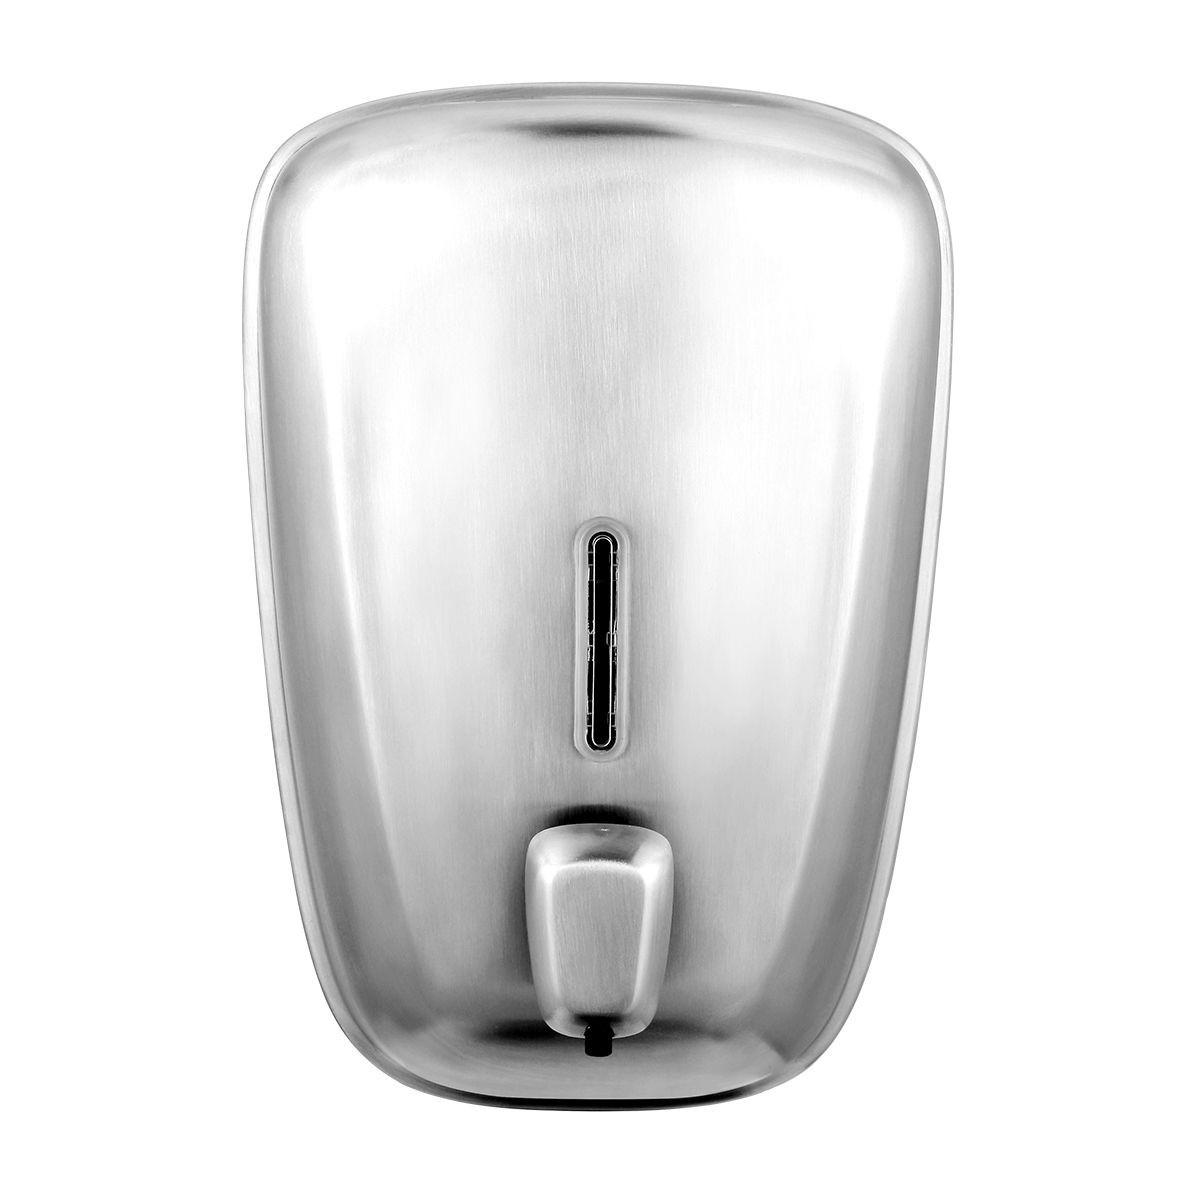 PW-NA 304 stainless steel soap dispenser 1200ml